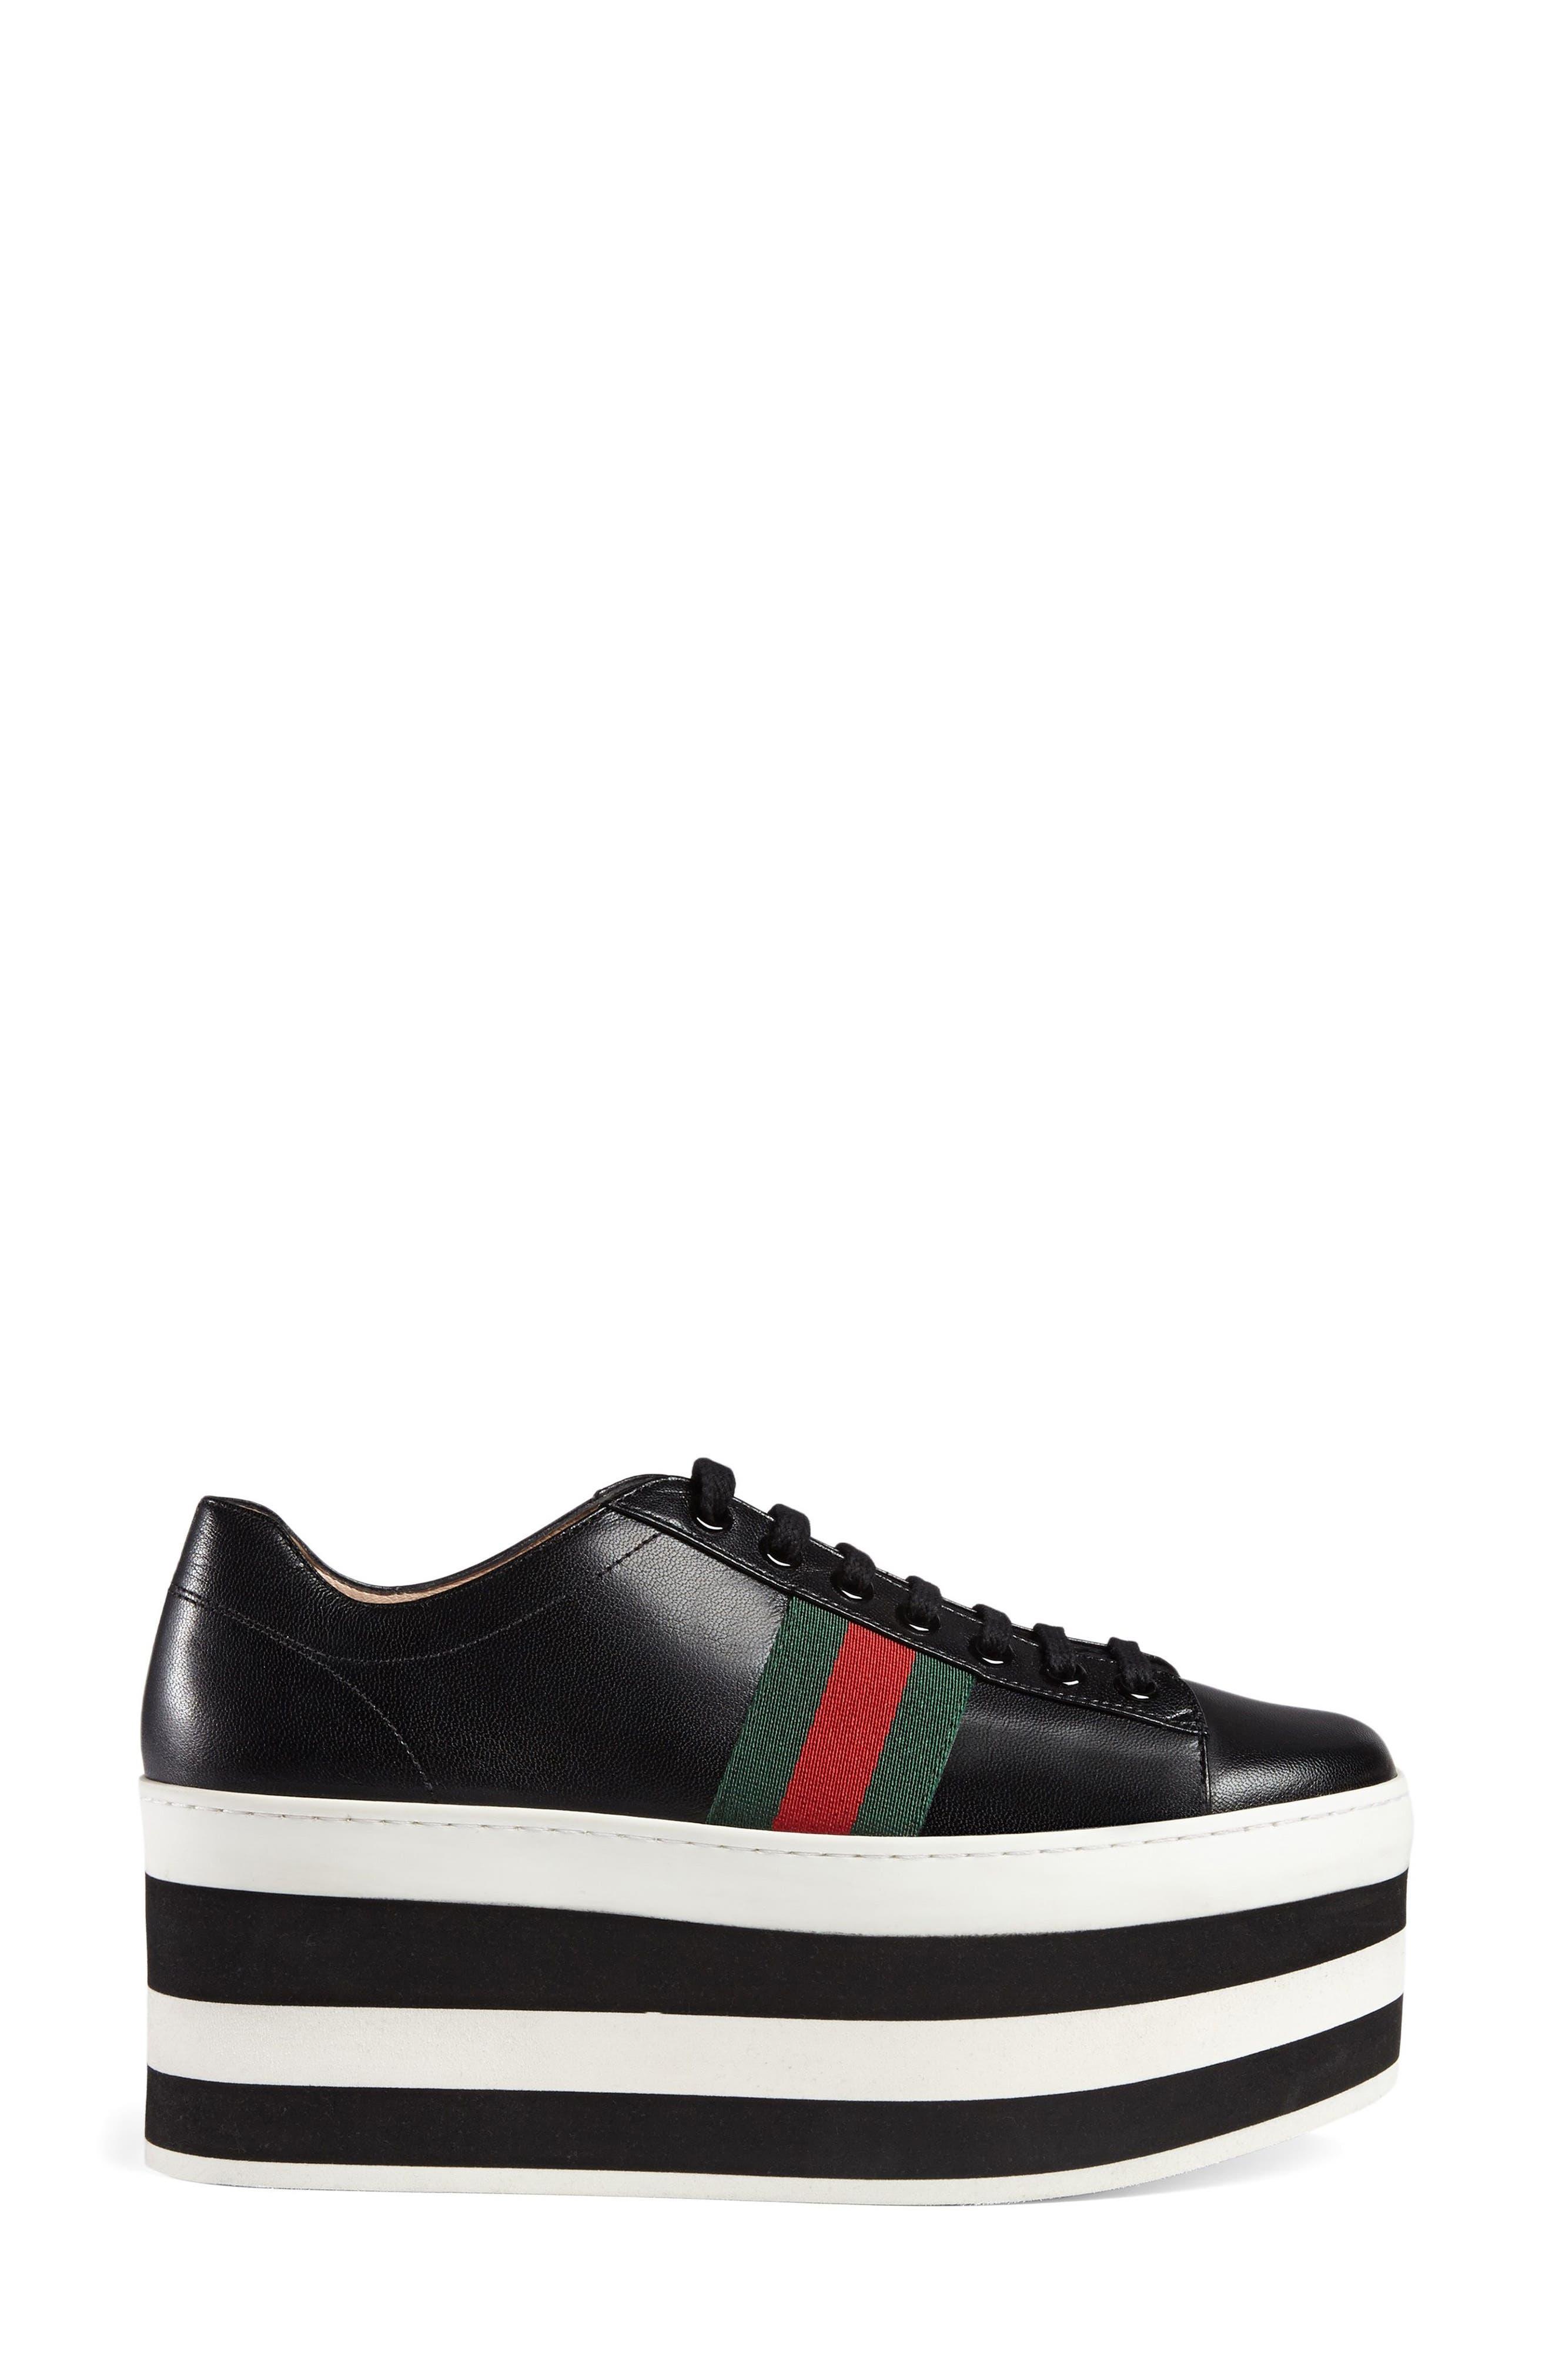 Peggy Flatform Sneaker,                             Main thumbnail 1, color,                             001